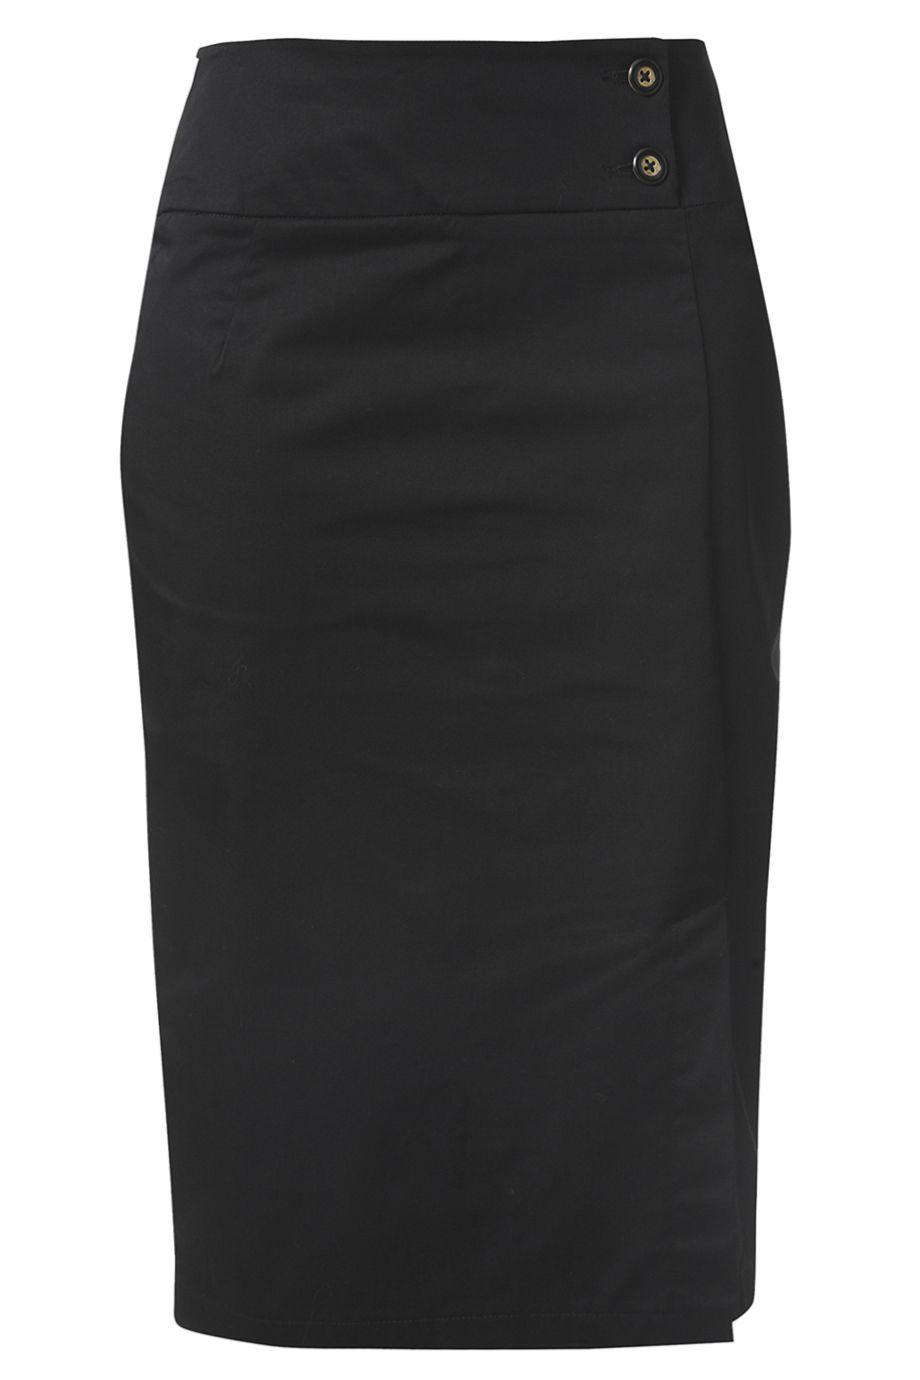 race sky marina black pencil skirt fashion black and